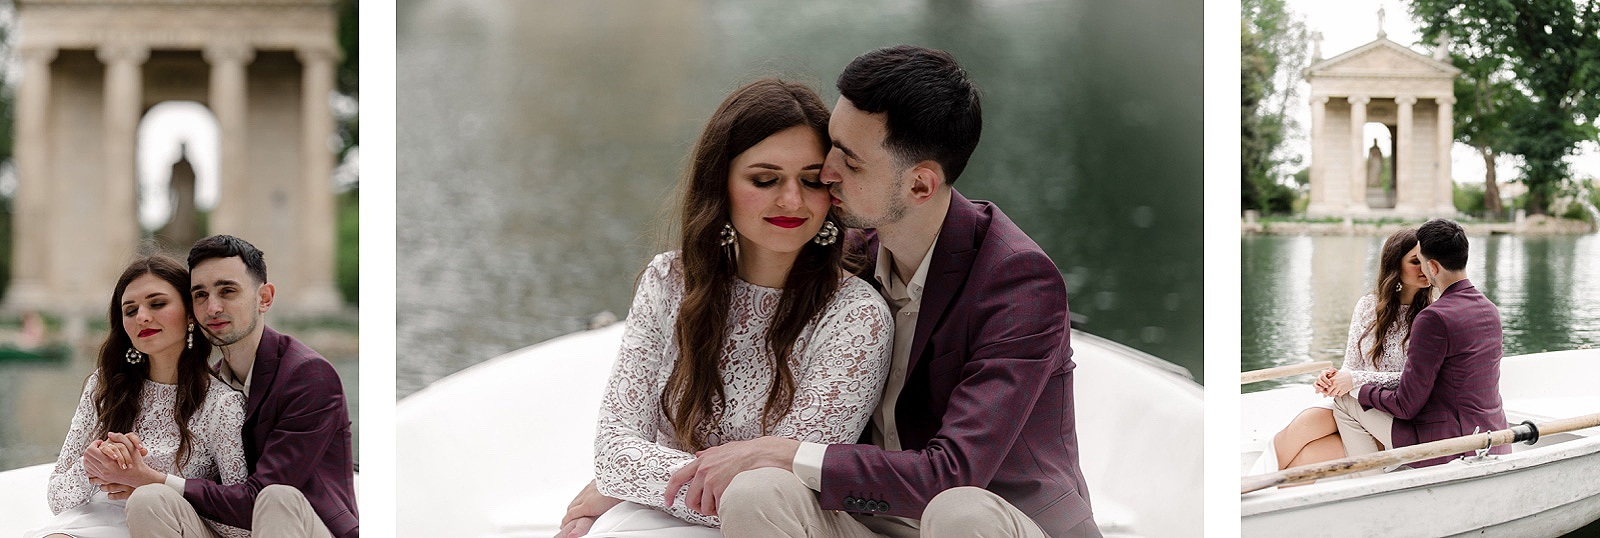 Fotomagoria+Wedding+Rome+Photographer+27.jpg